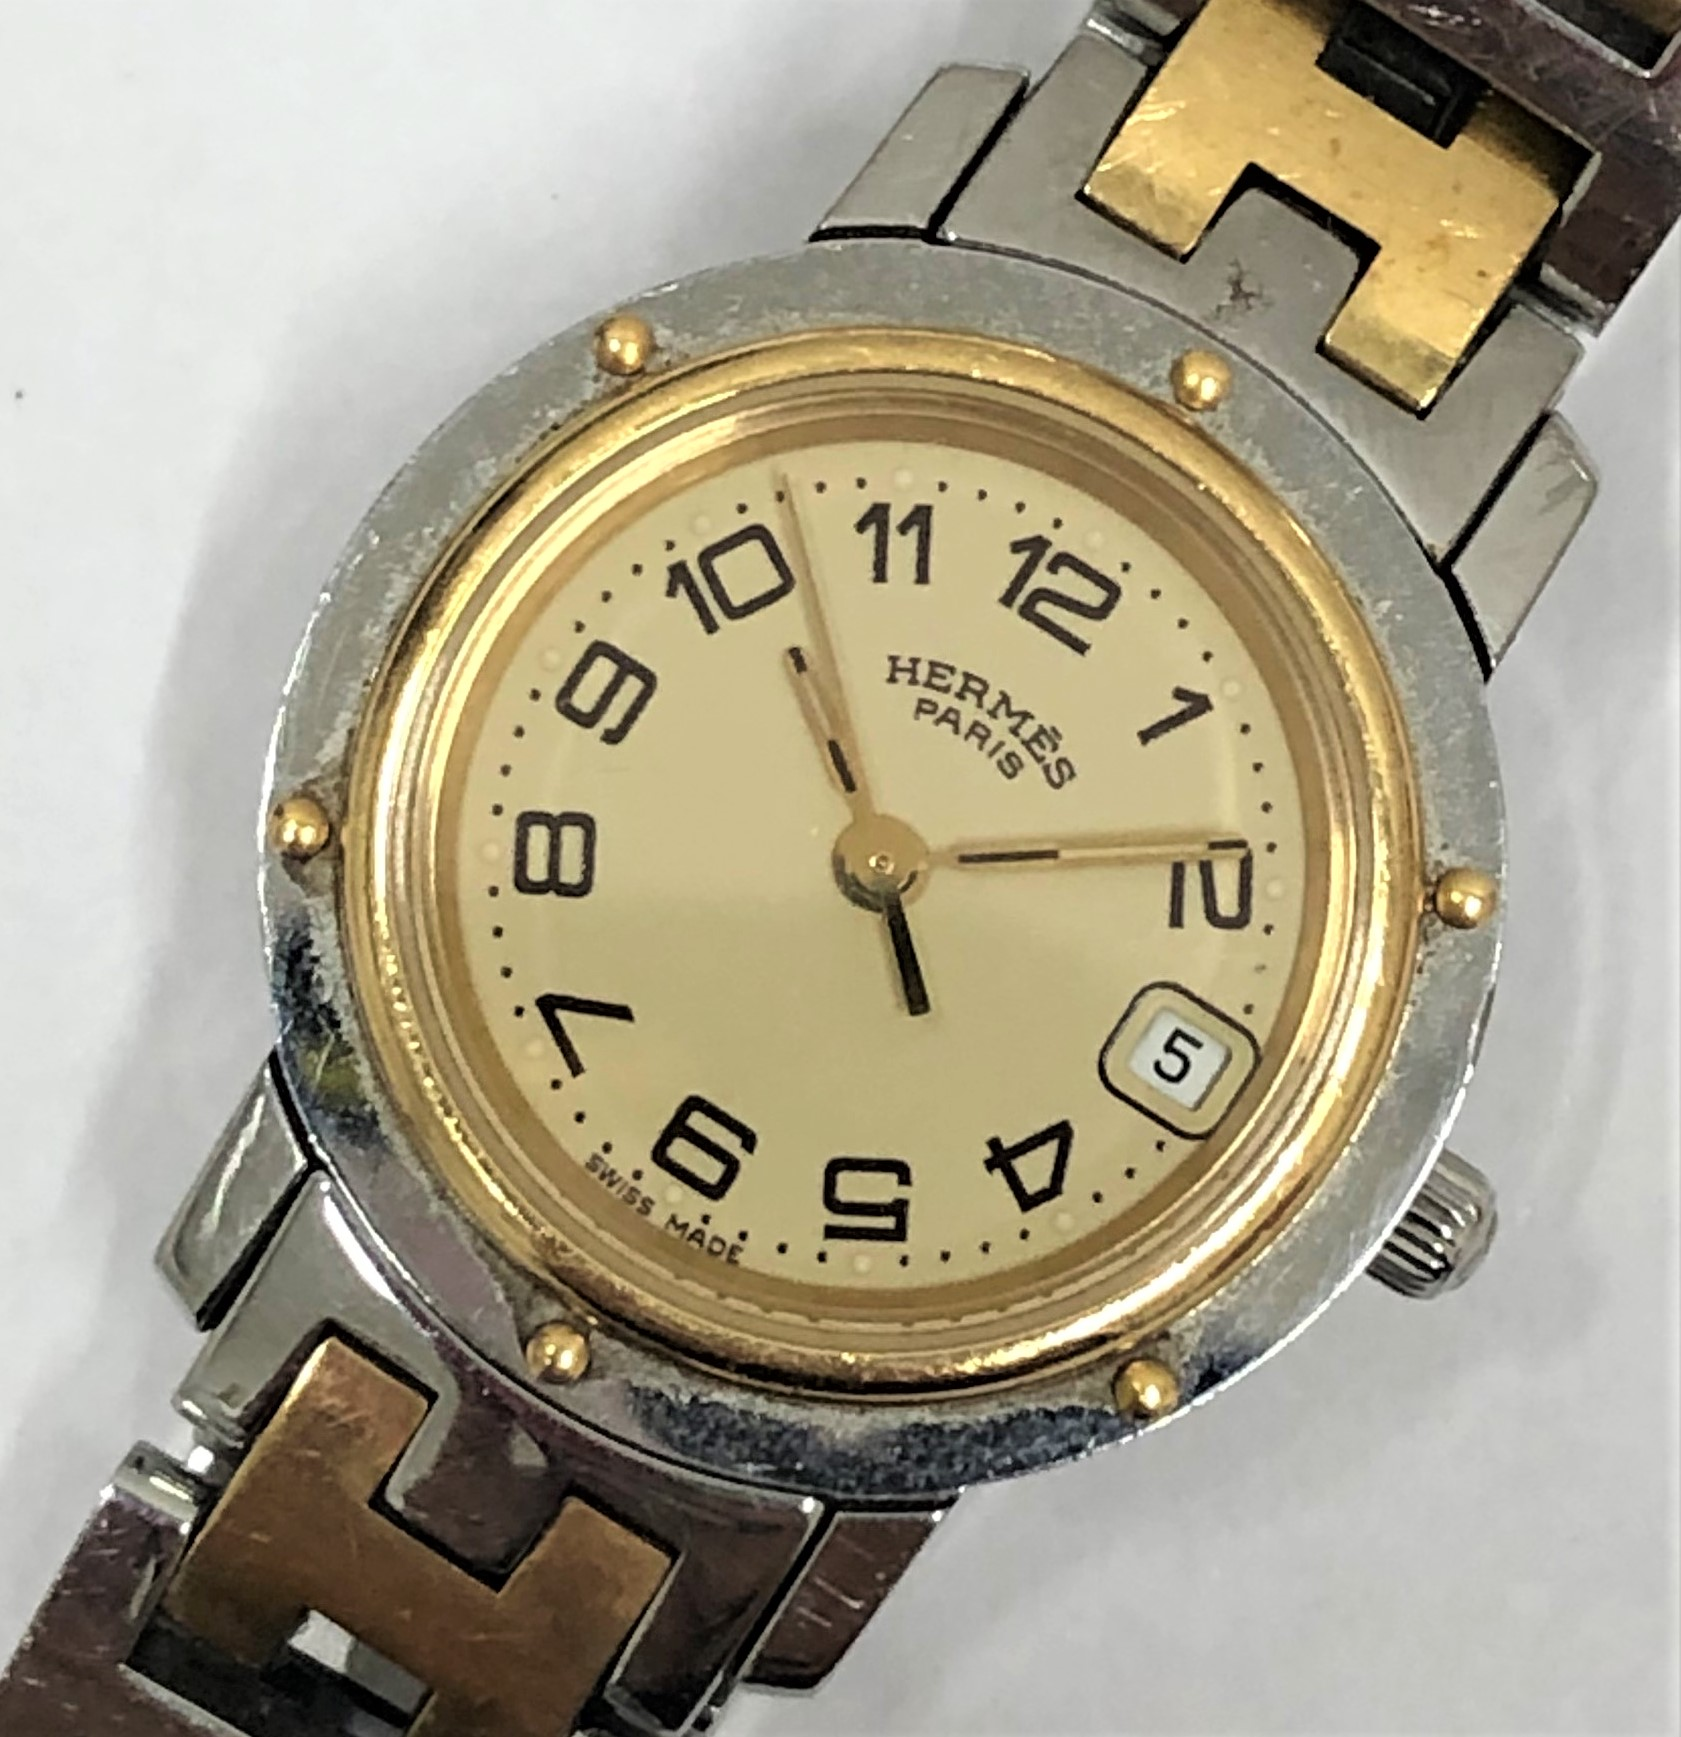 【HERMES/エルメス】クリッパー コンビ CL4.220 QZ 腕時計